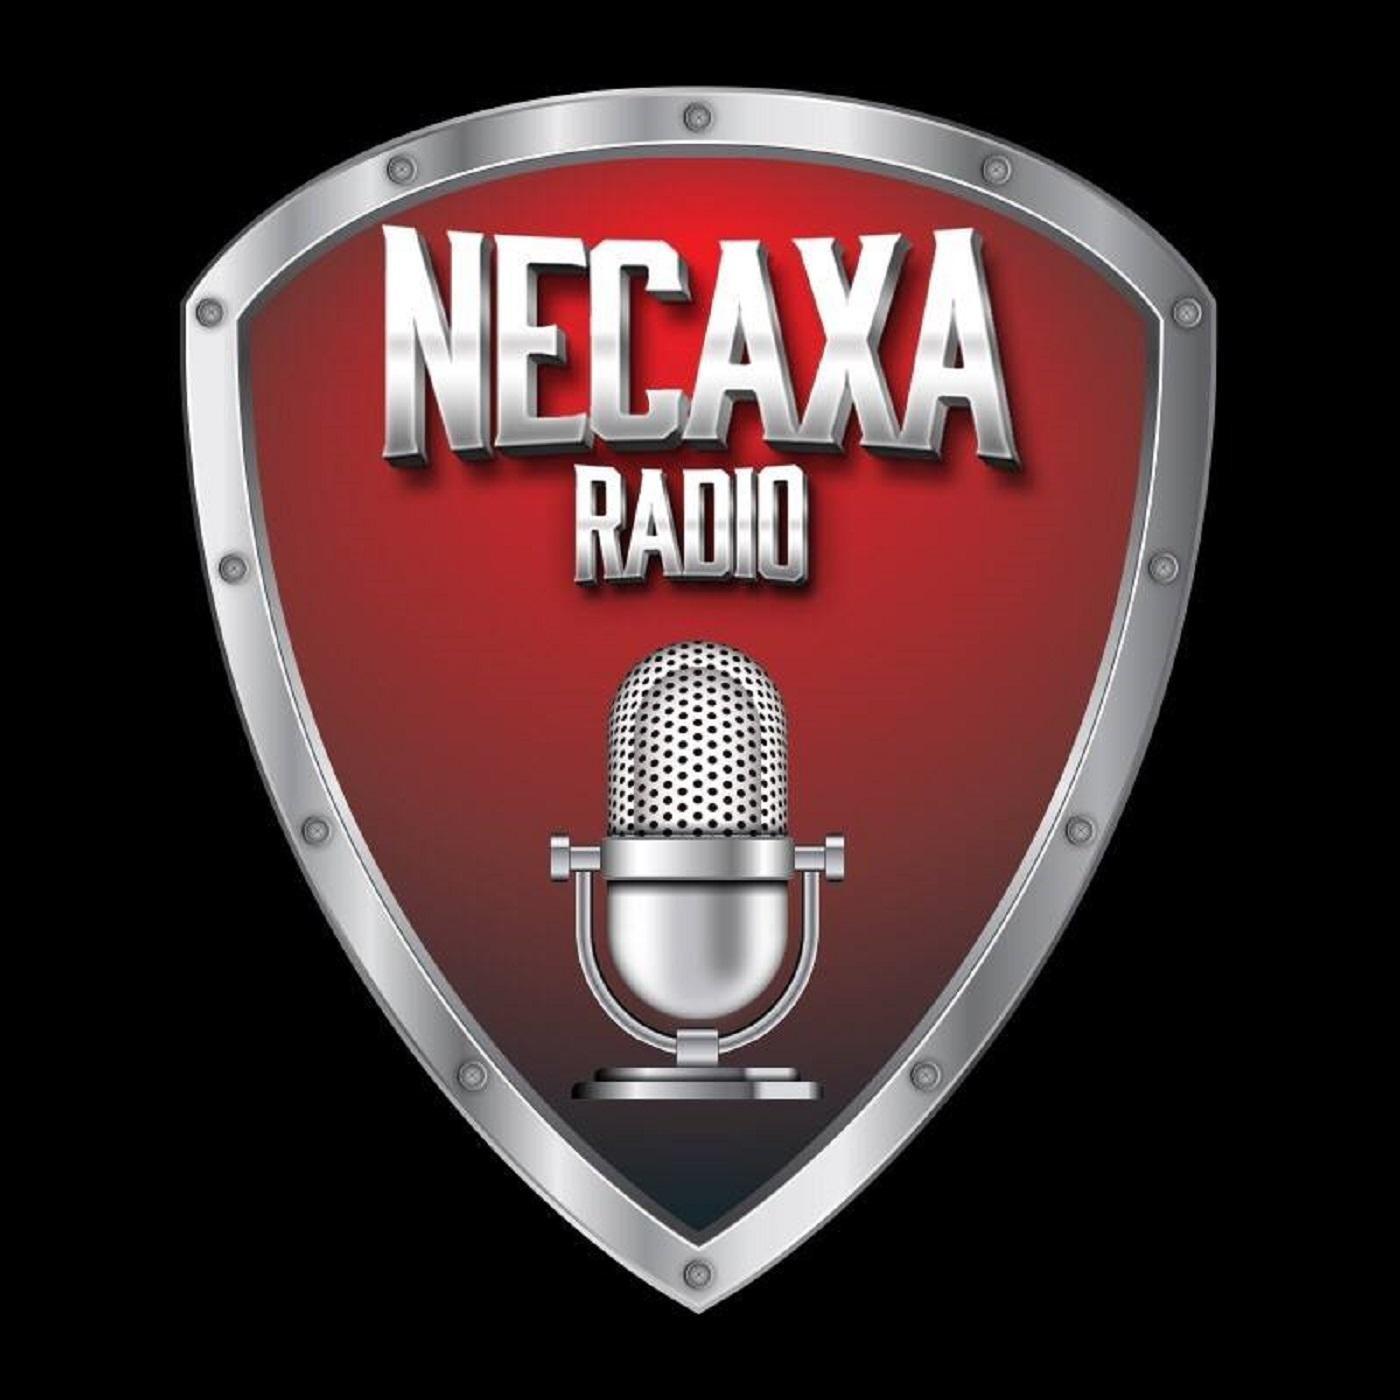 <![CDATA[Necaxa Radio]]>